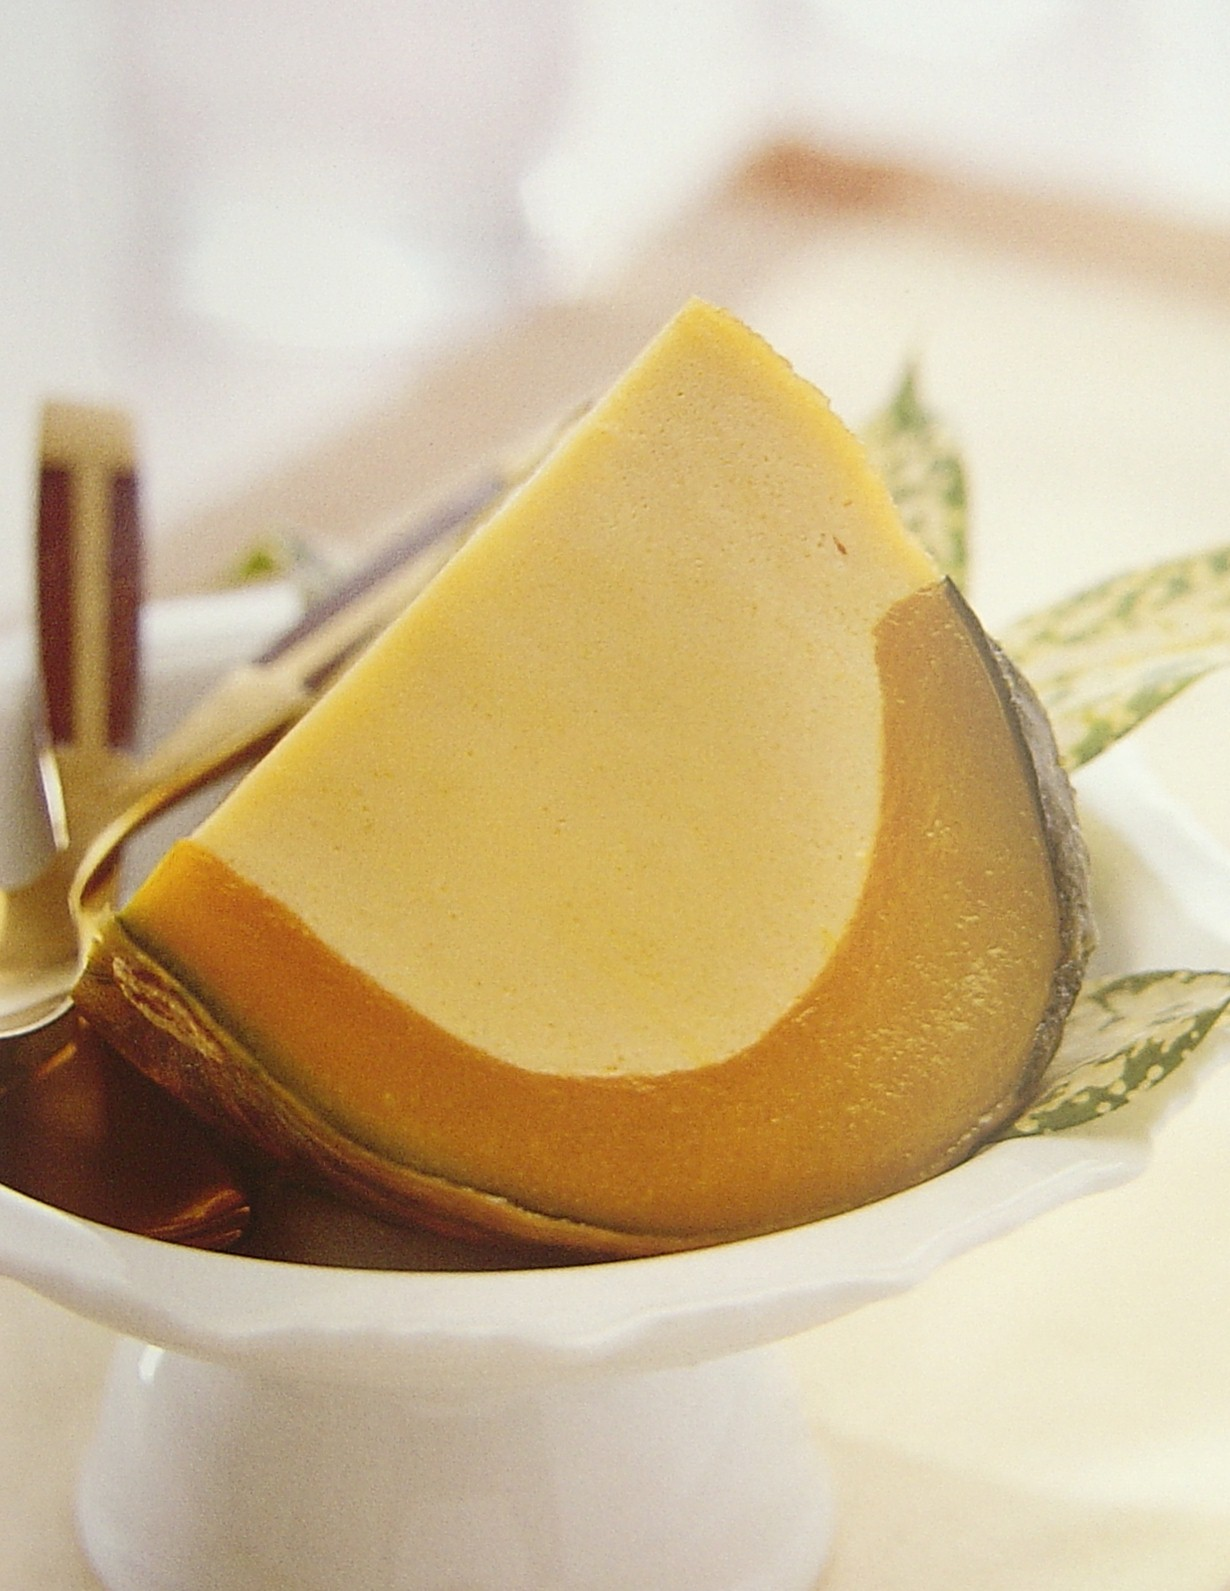 Thai Dessert Recipes: Coconut custard in pumpkin (sangkhaya fak thong)